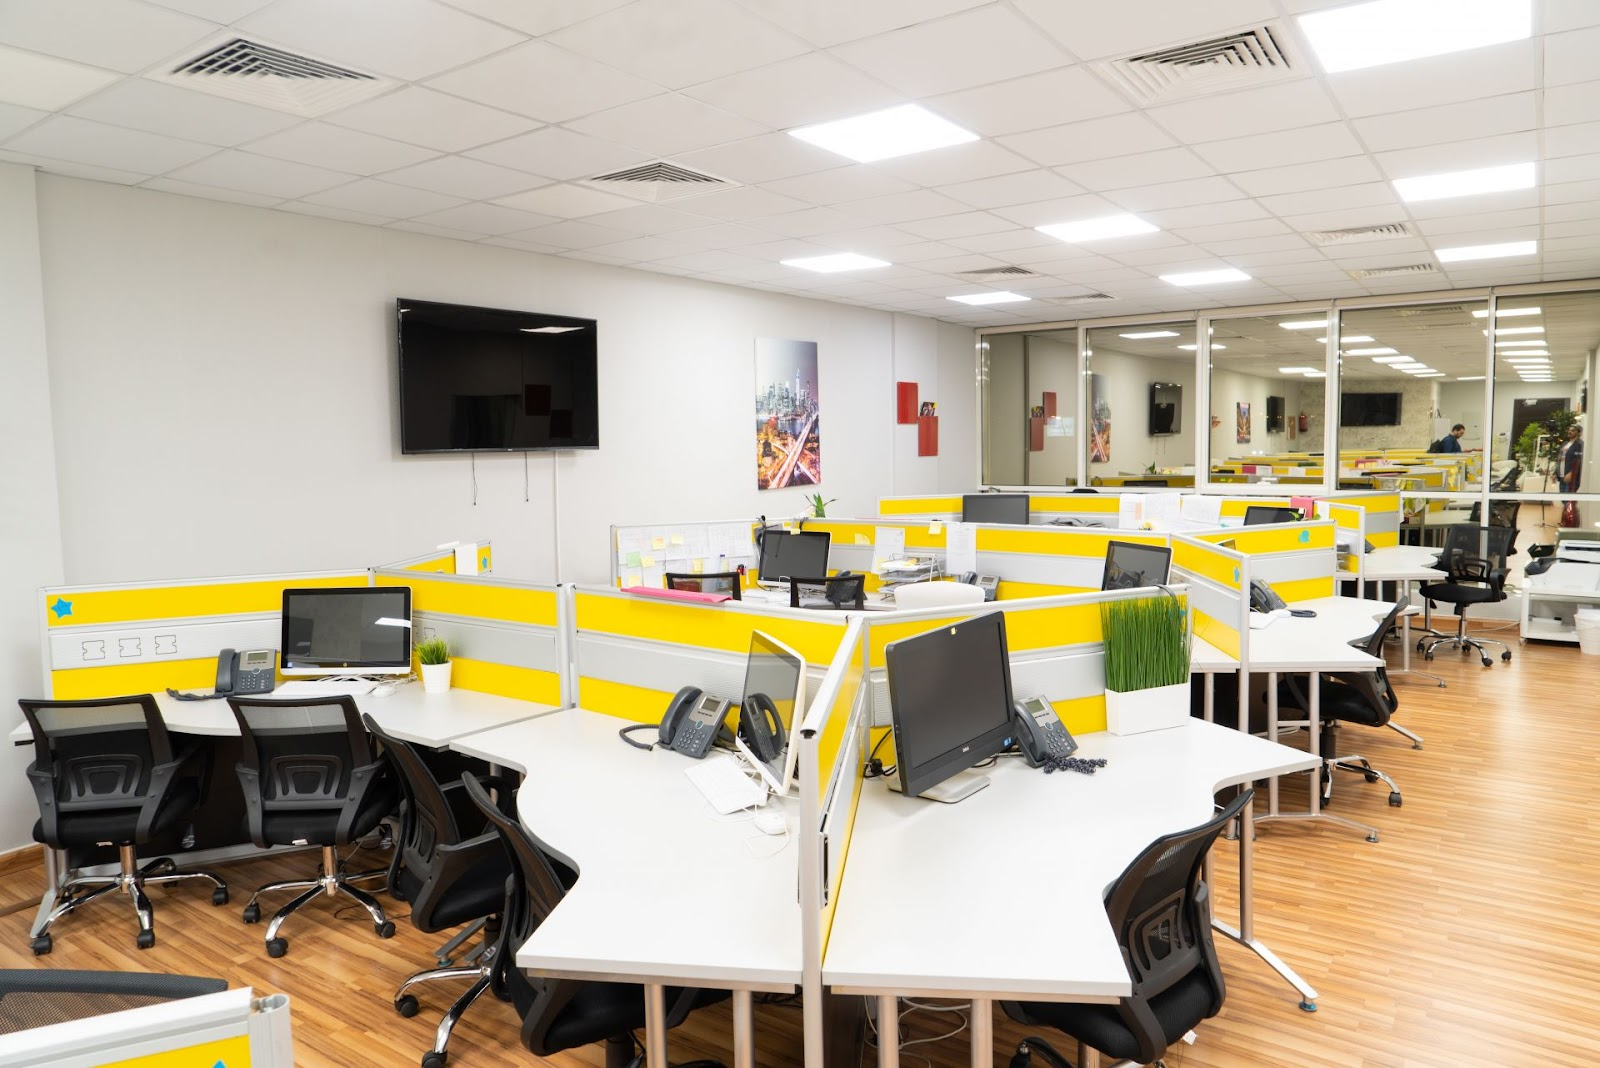 7 Best Coworking Space in Riyadh, Saudi Arabia [2020 List] 14